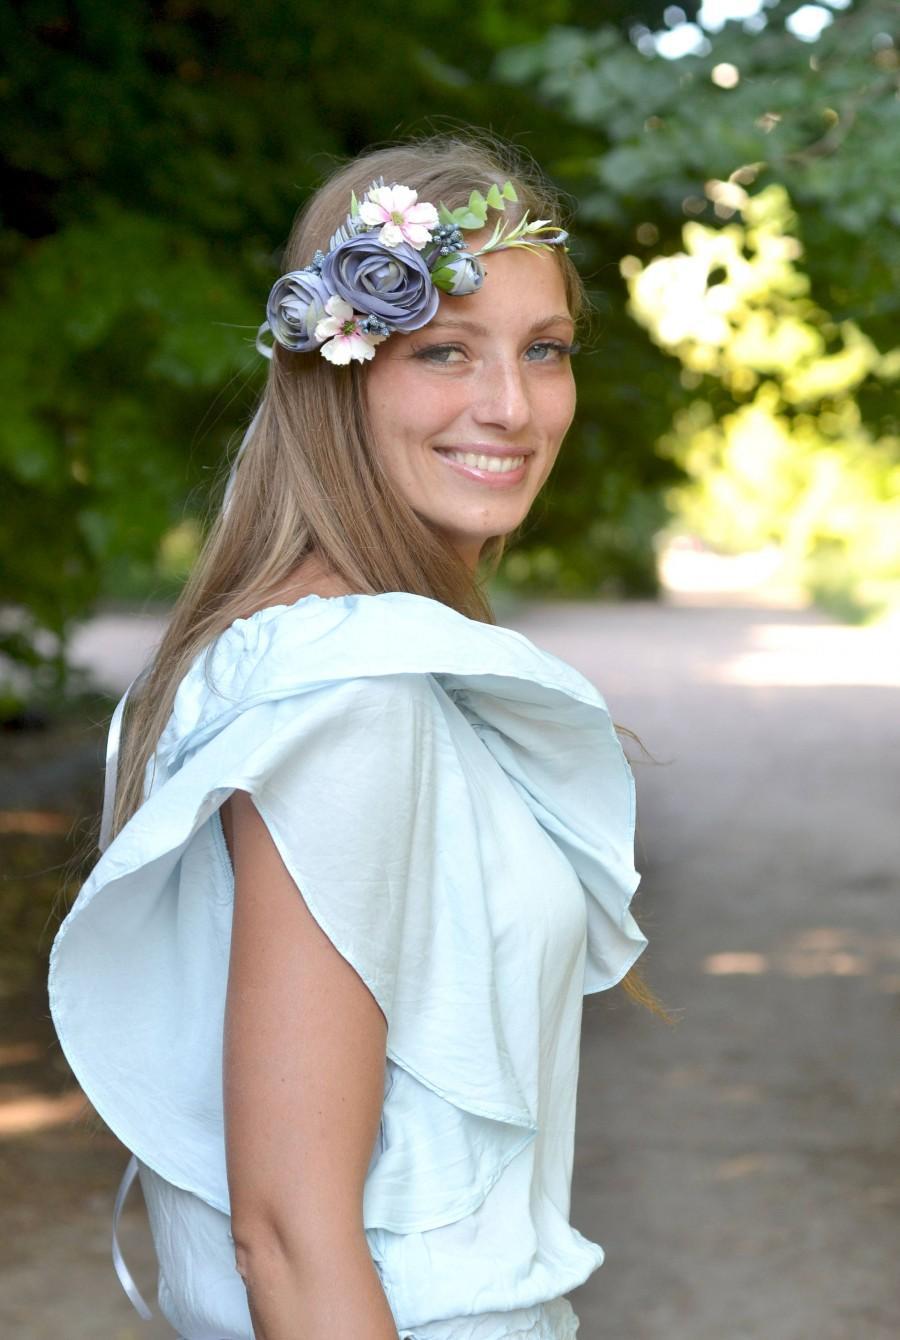 زفاف - Serenity flower crown wedding ash blue floral headband bridal flowers head wreath Serenity hair dress floral crown Ready to ship